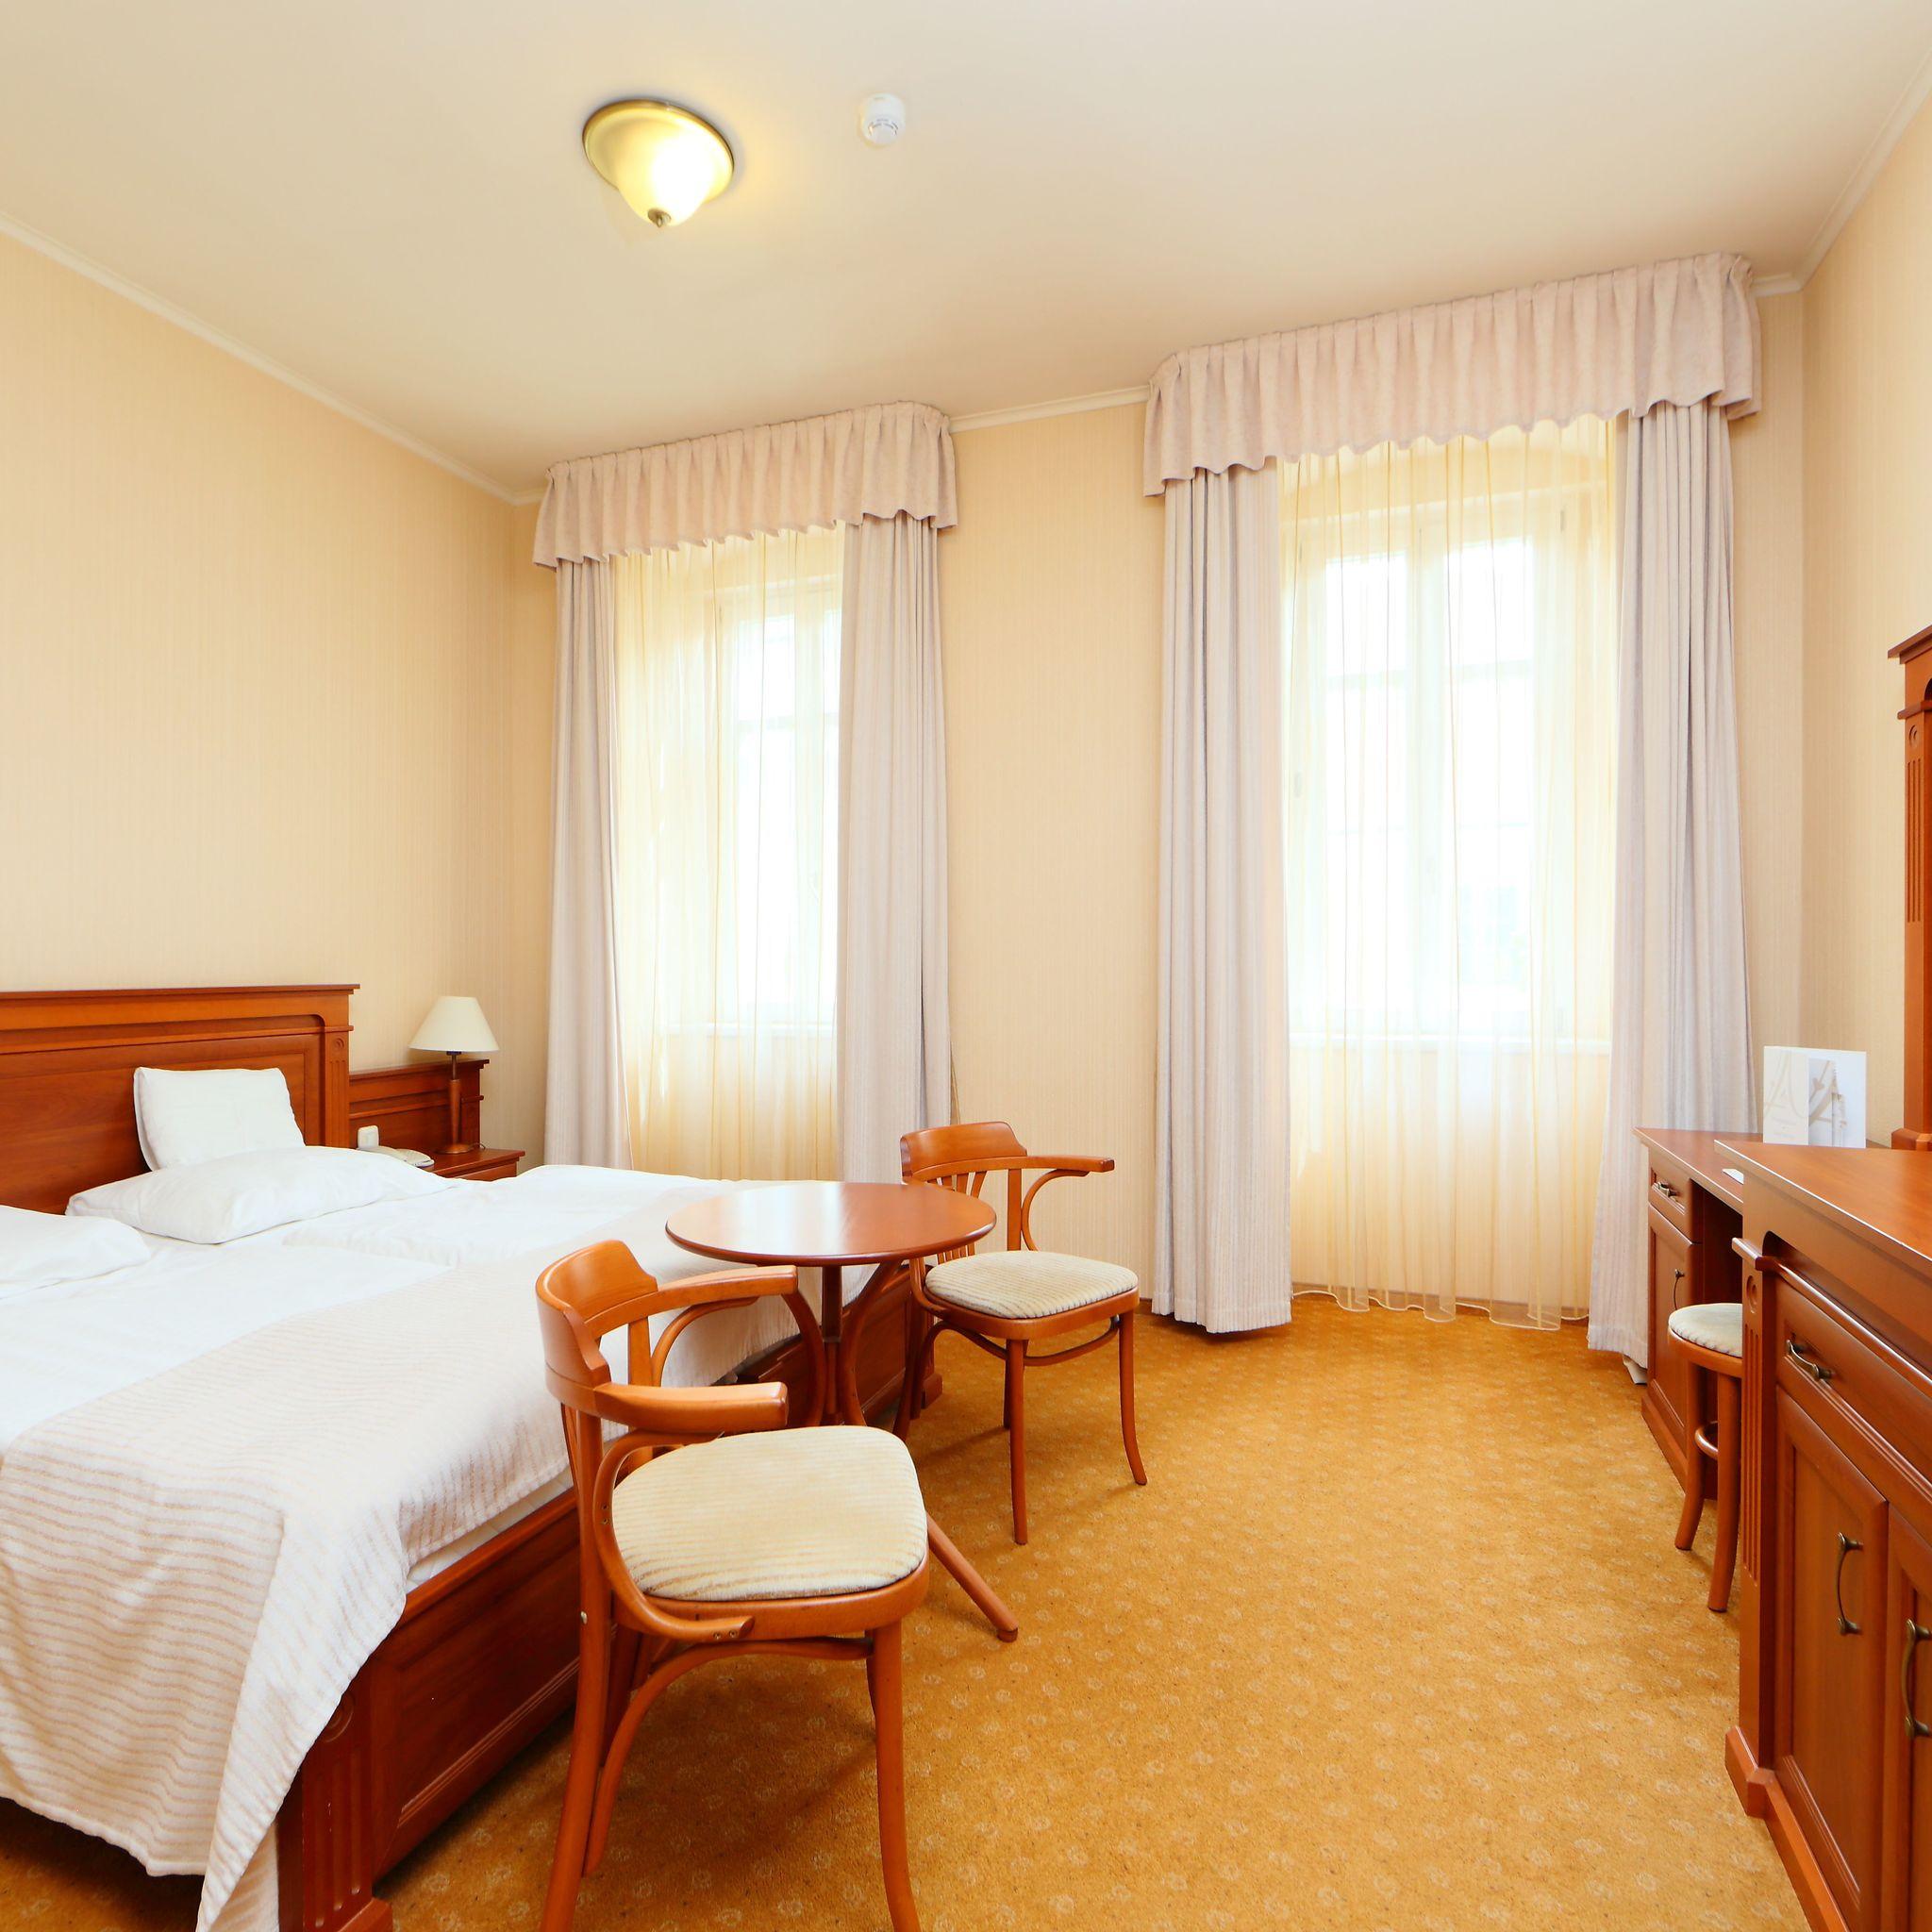 Anna Grand Hotel Wine&Vital Balatonfüred - Classic típusú kétágyas szoba